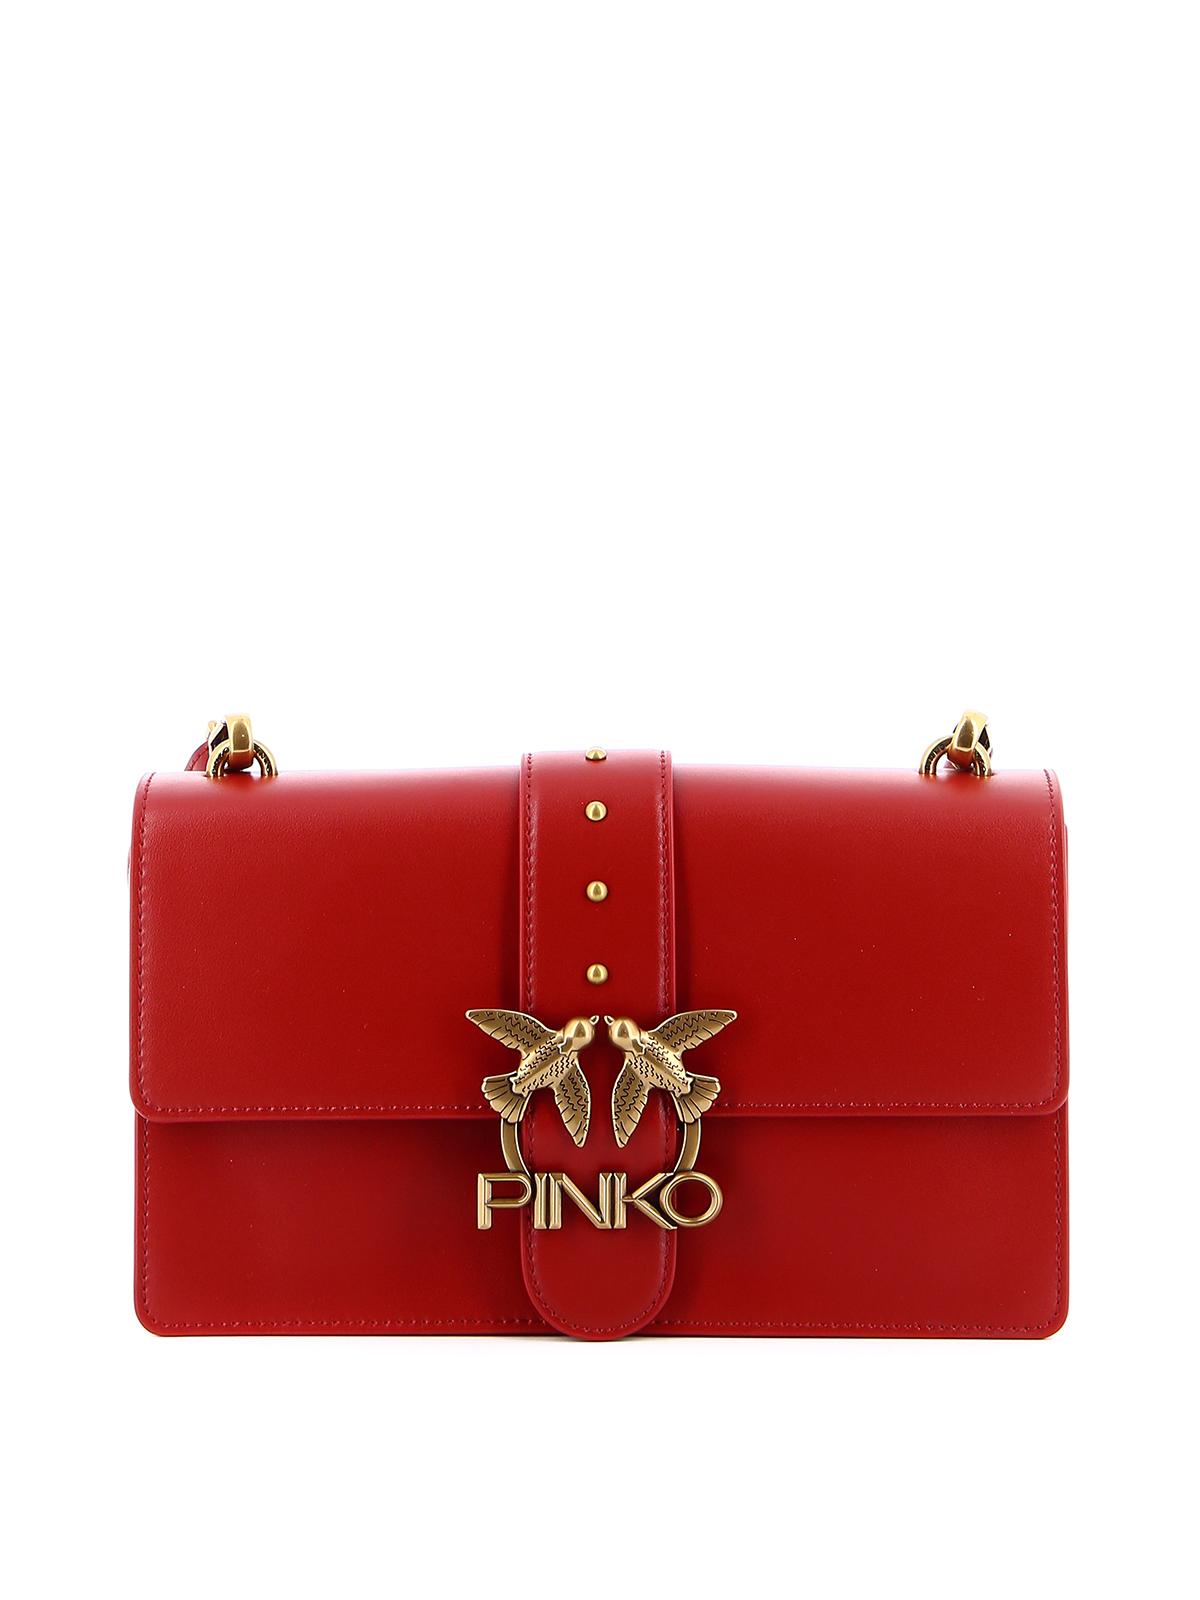 Pinko CLASSIC LOVE ICON SIMPLY BAG